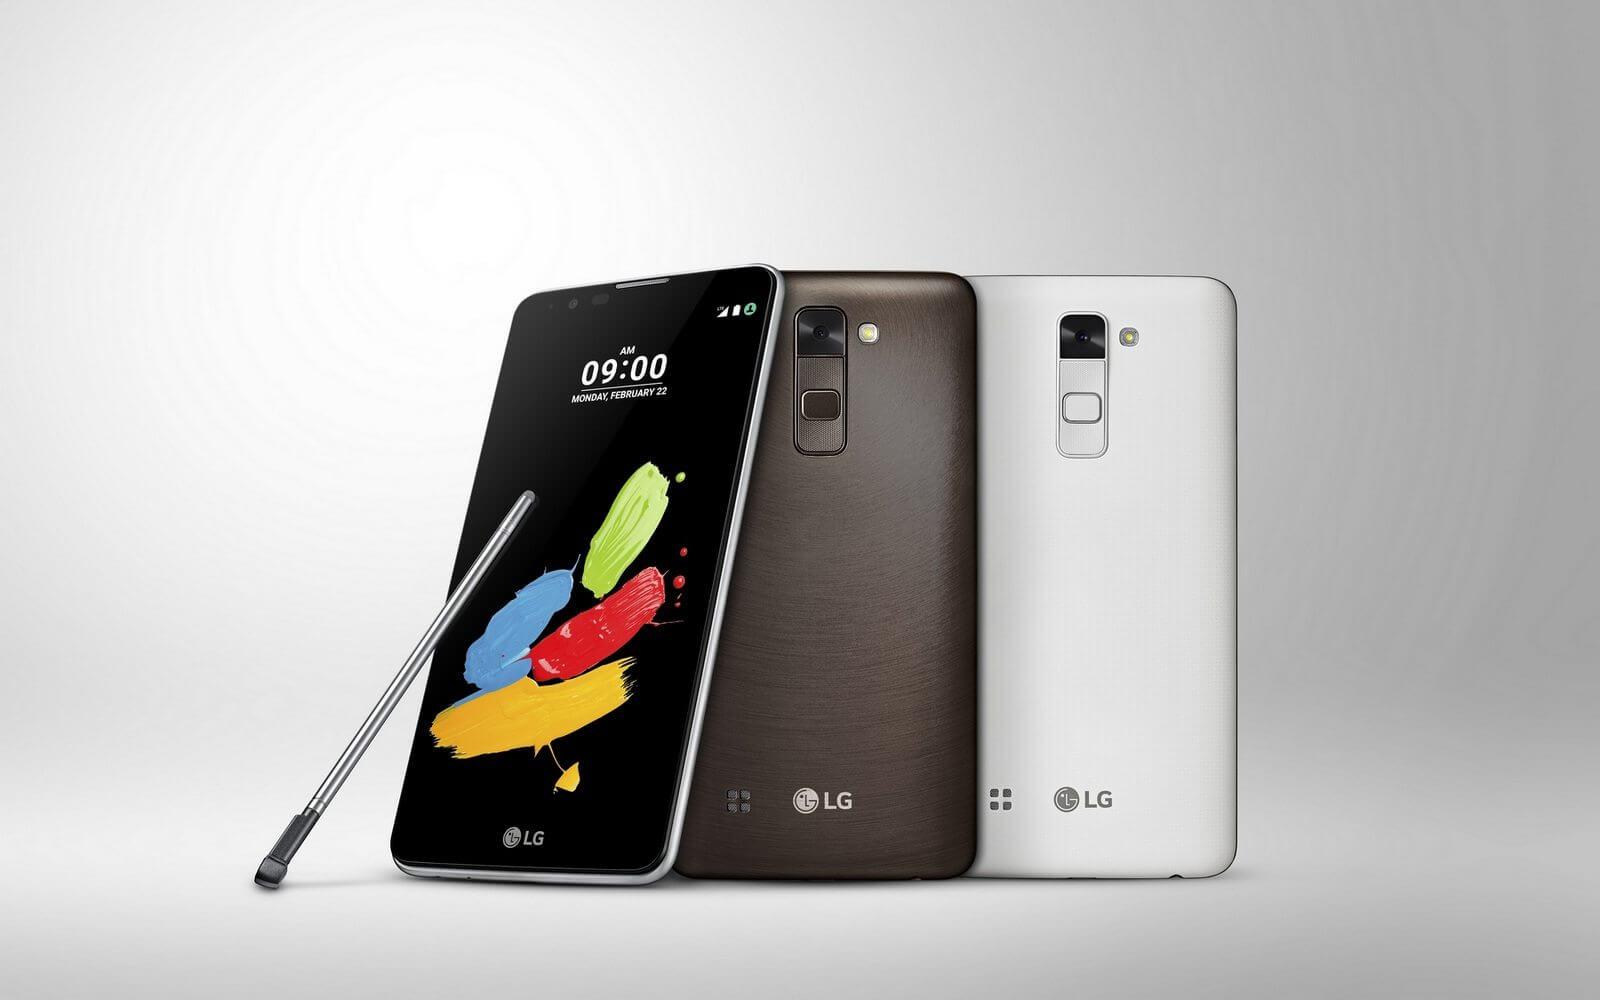 smt lgstylus2 capa - LG Stylus 2 é lançado antes da MWC 2016